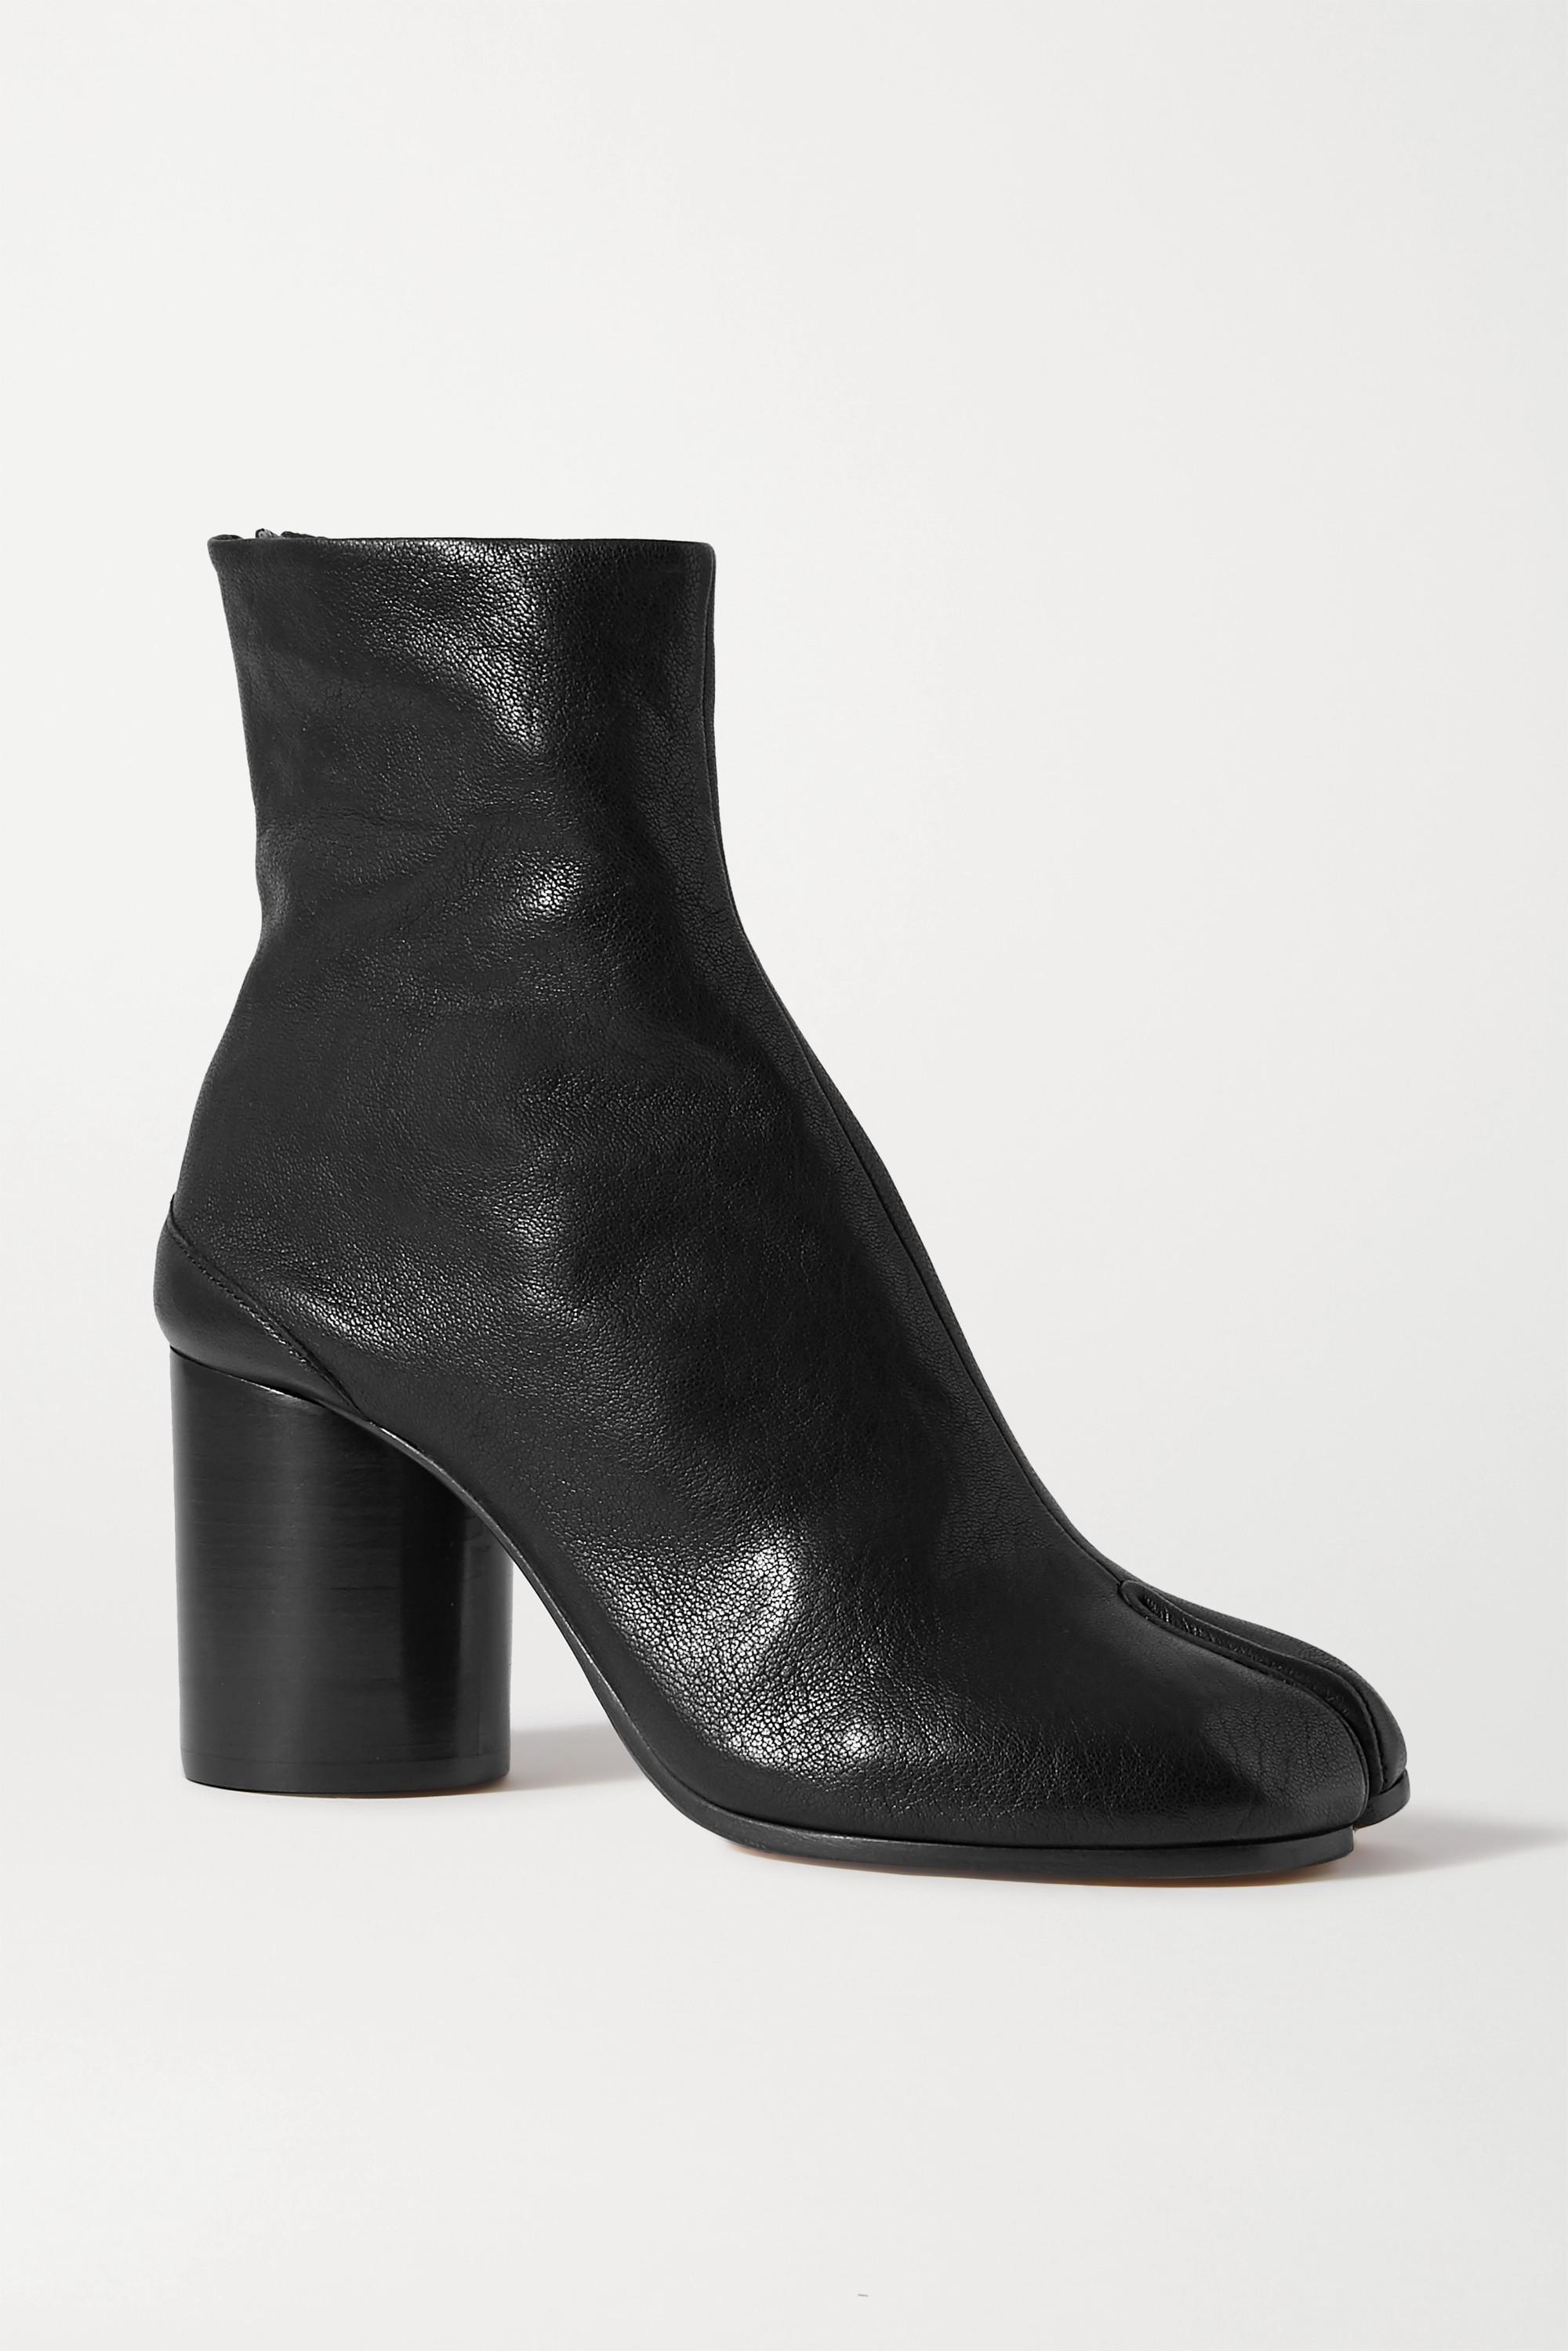 maison margiela split toe shoes